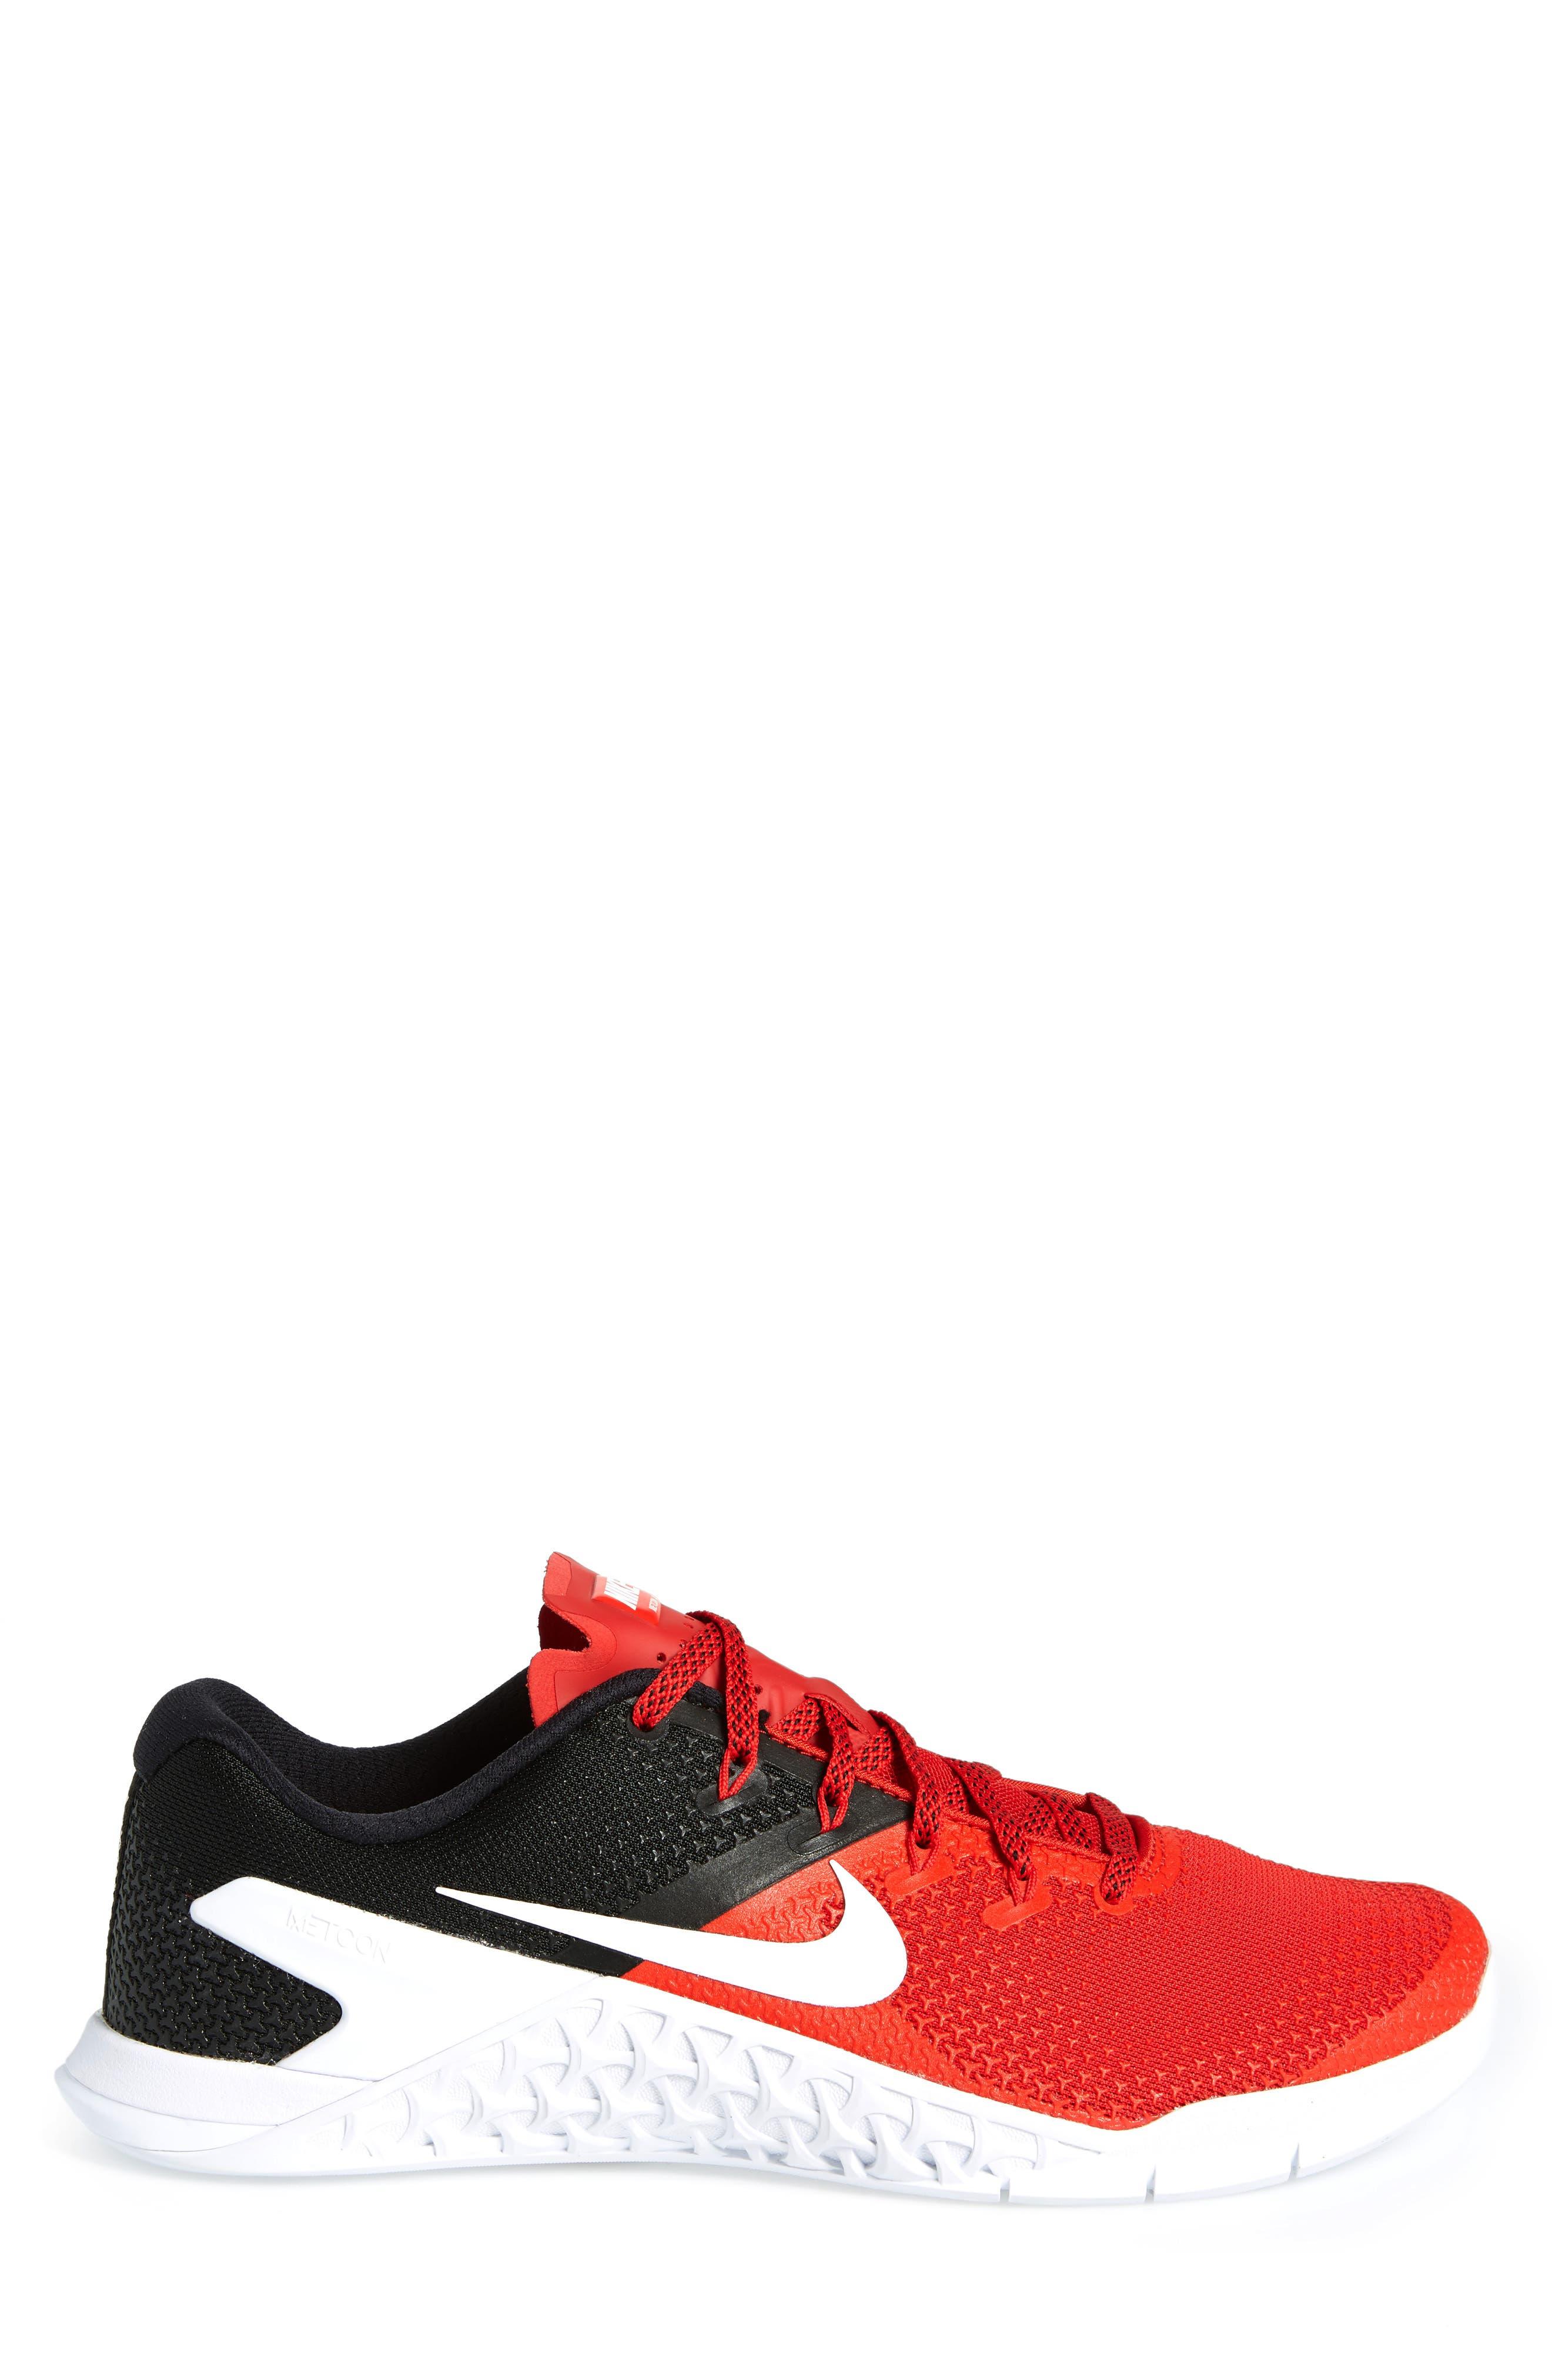 Metcon 4 Training Shoe,                             Alternate thumbnail 49, color,